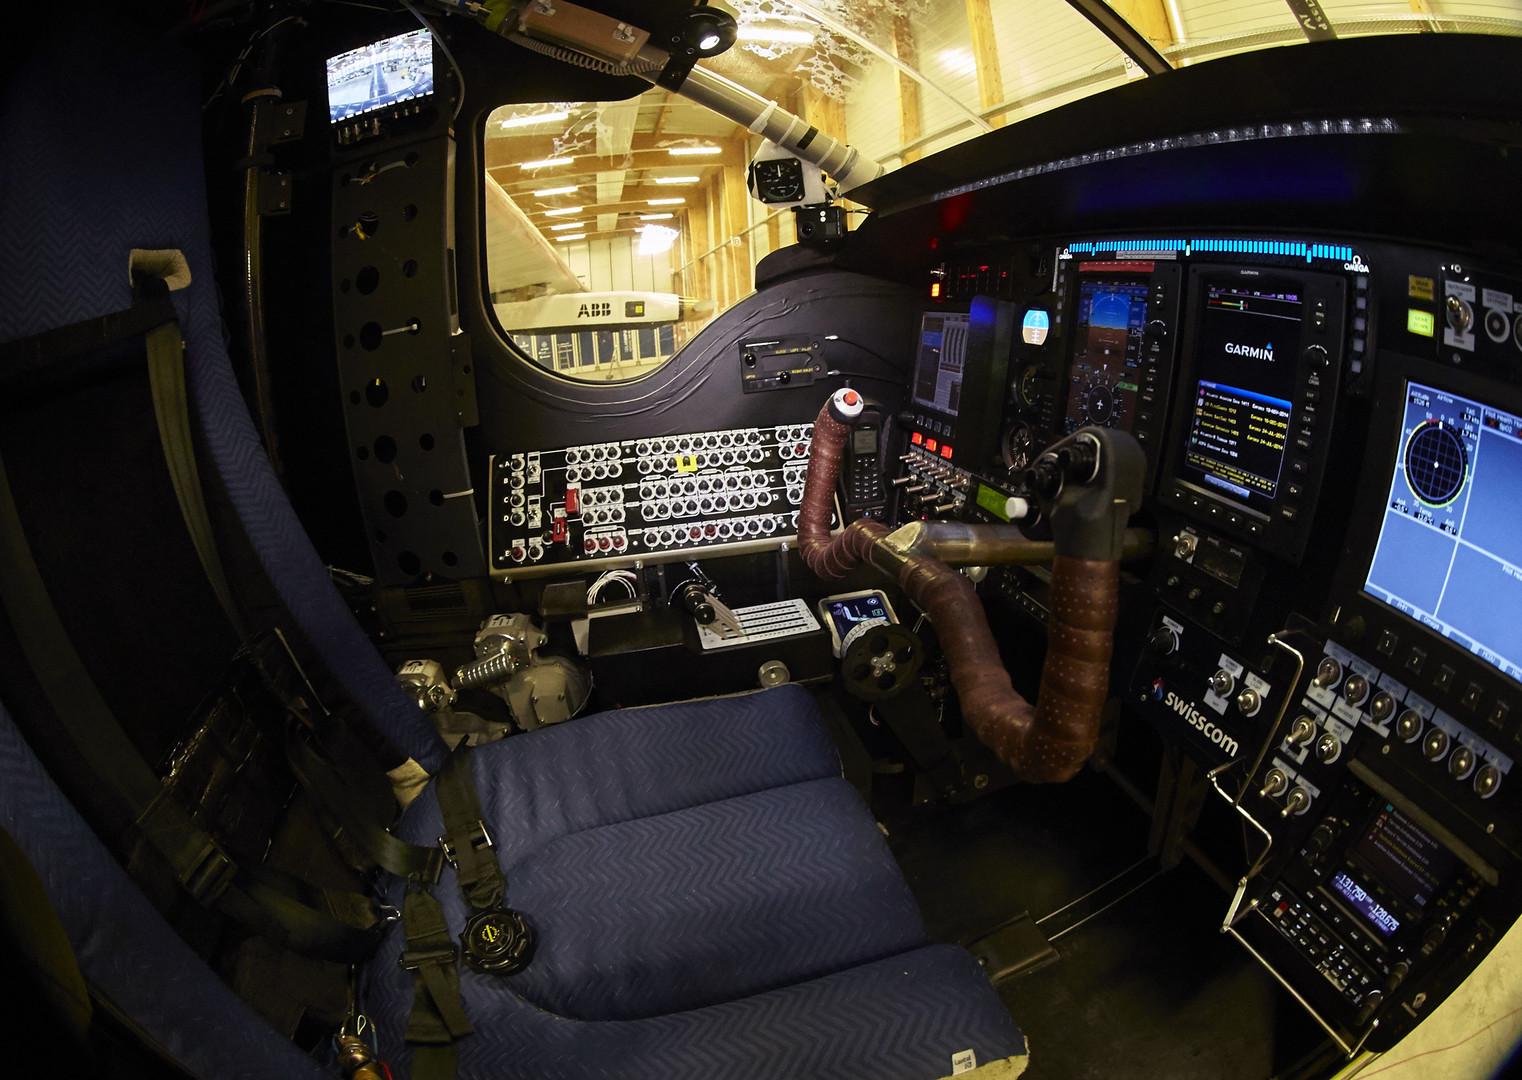 Кабина самолёта Solar Impulse 2 для одного пилота